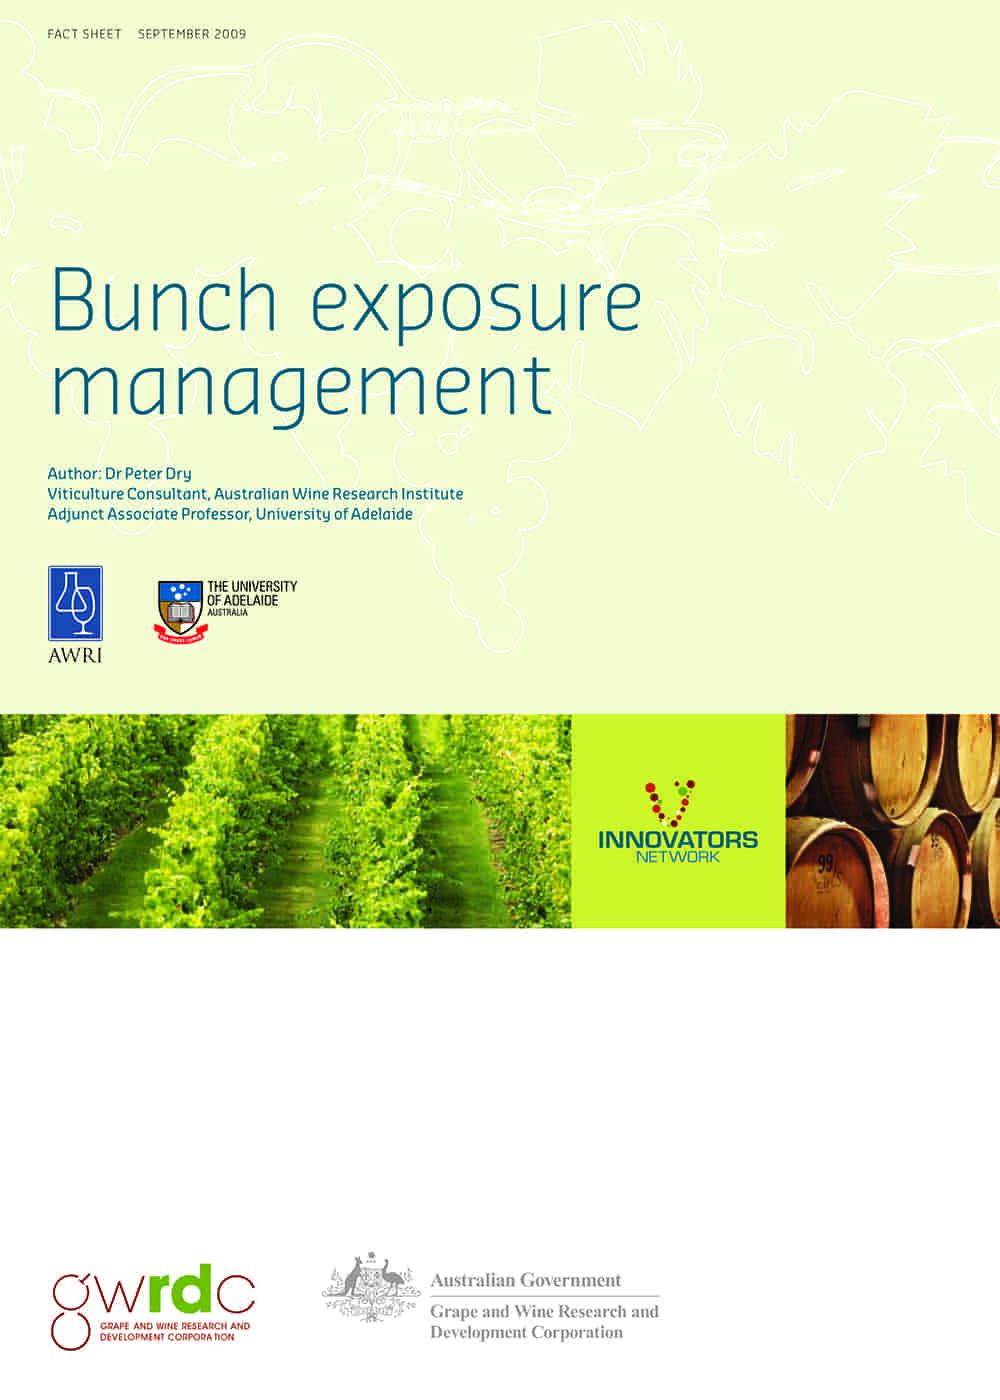 Bunch exposure management